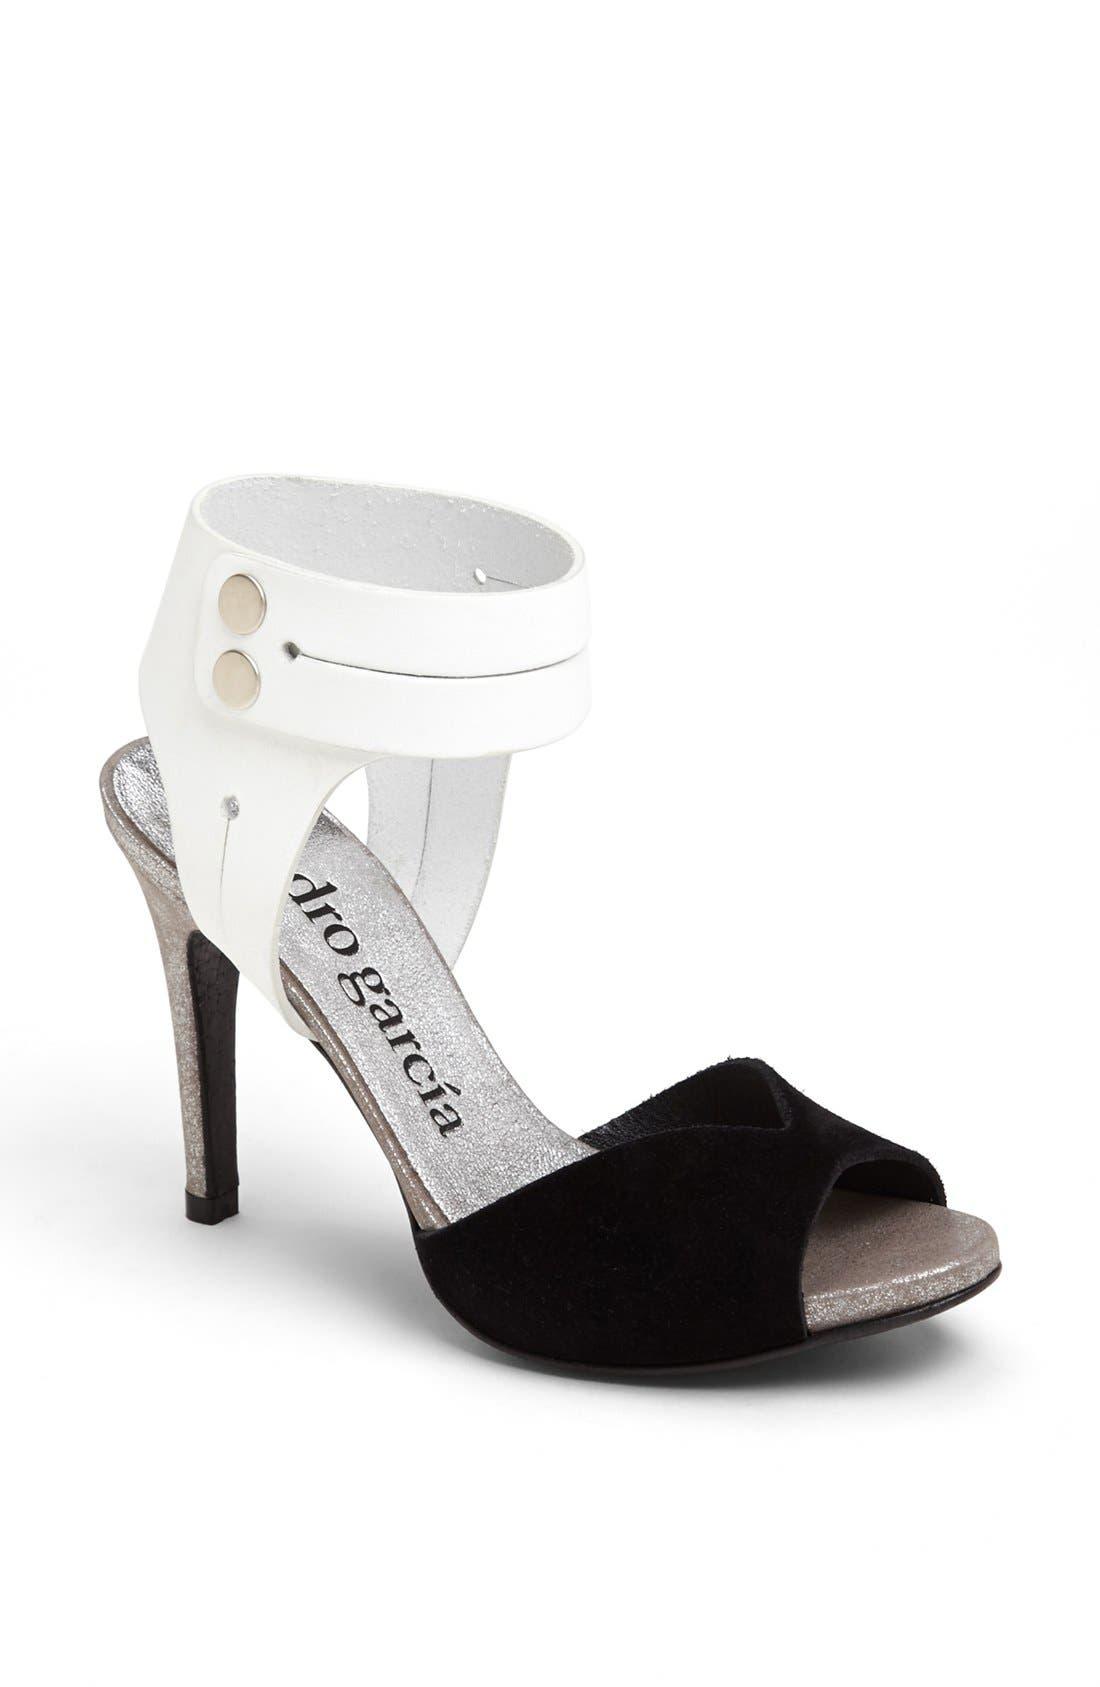 Main Image - Pedro Garcia 'Sheryl' Ankle Strap Sandal